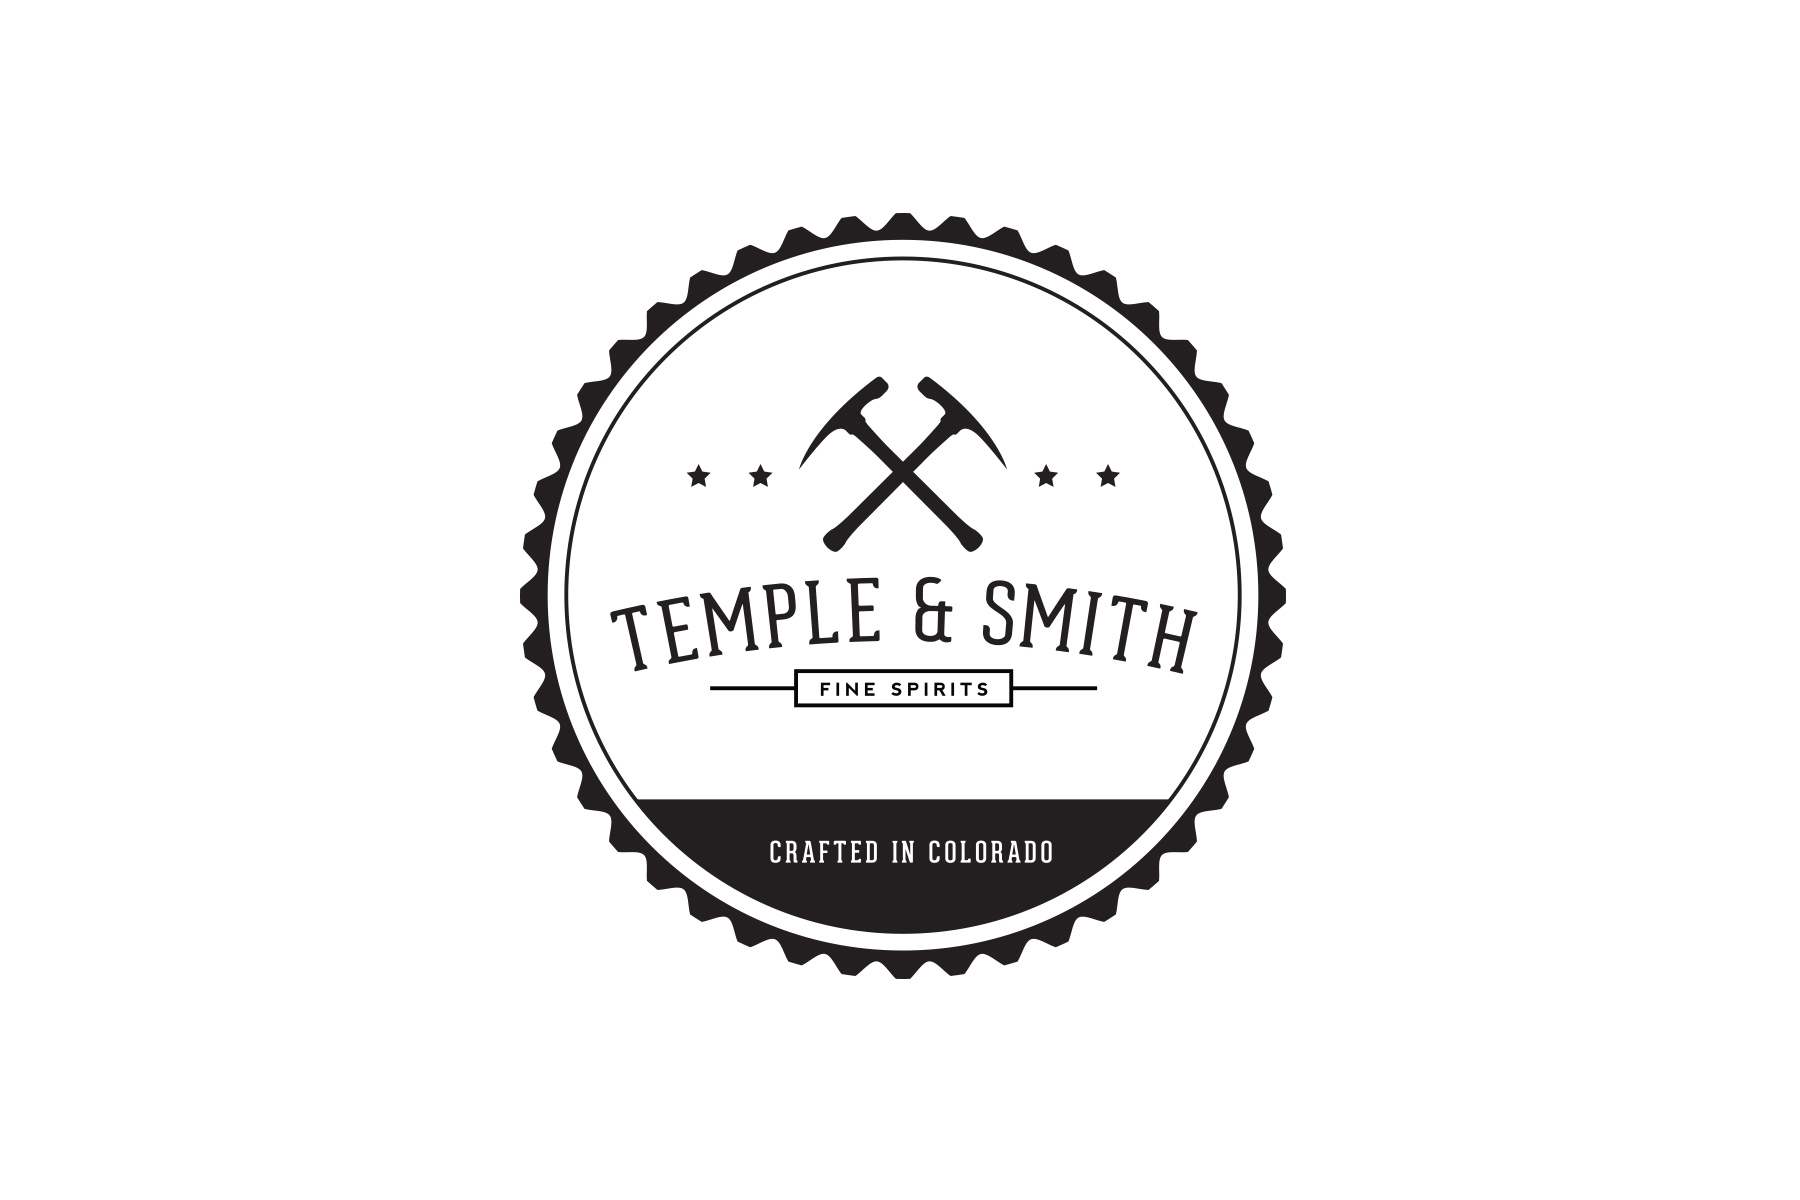 TempleSmith_6x4_ALT4.jpg